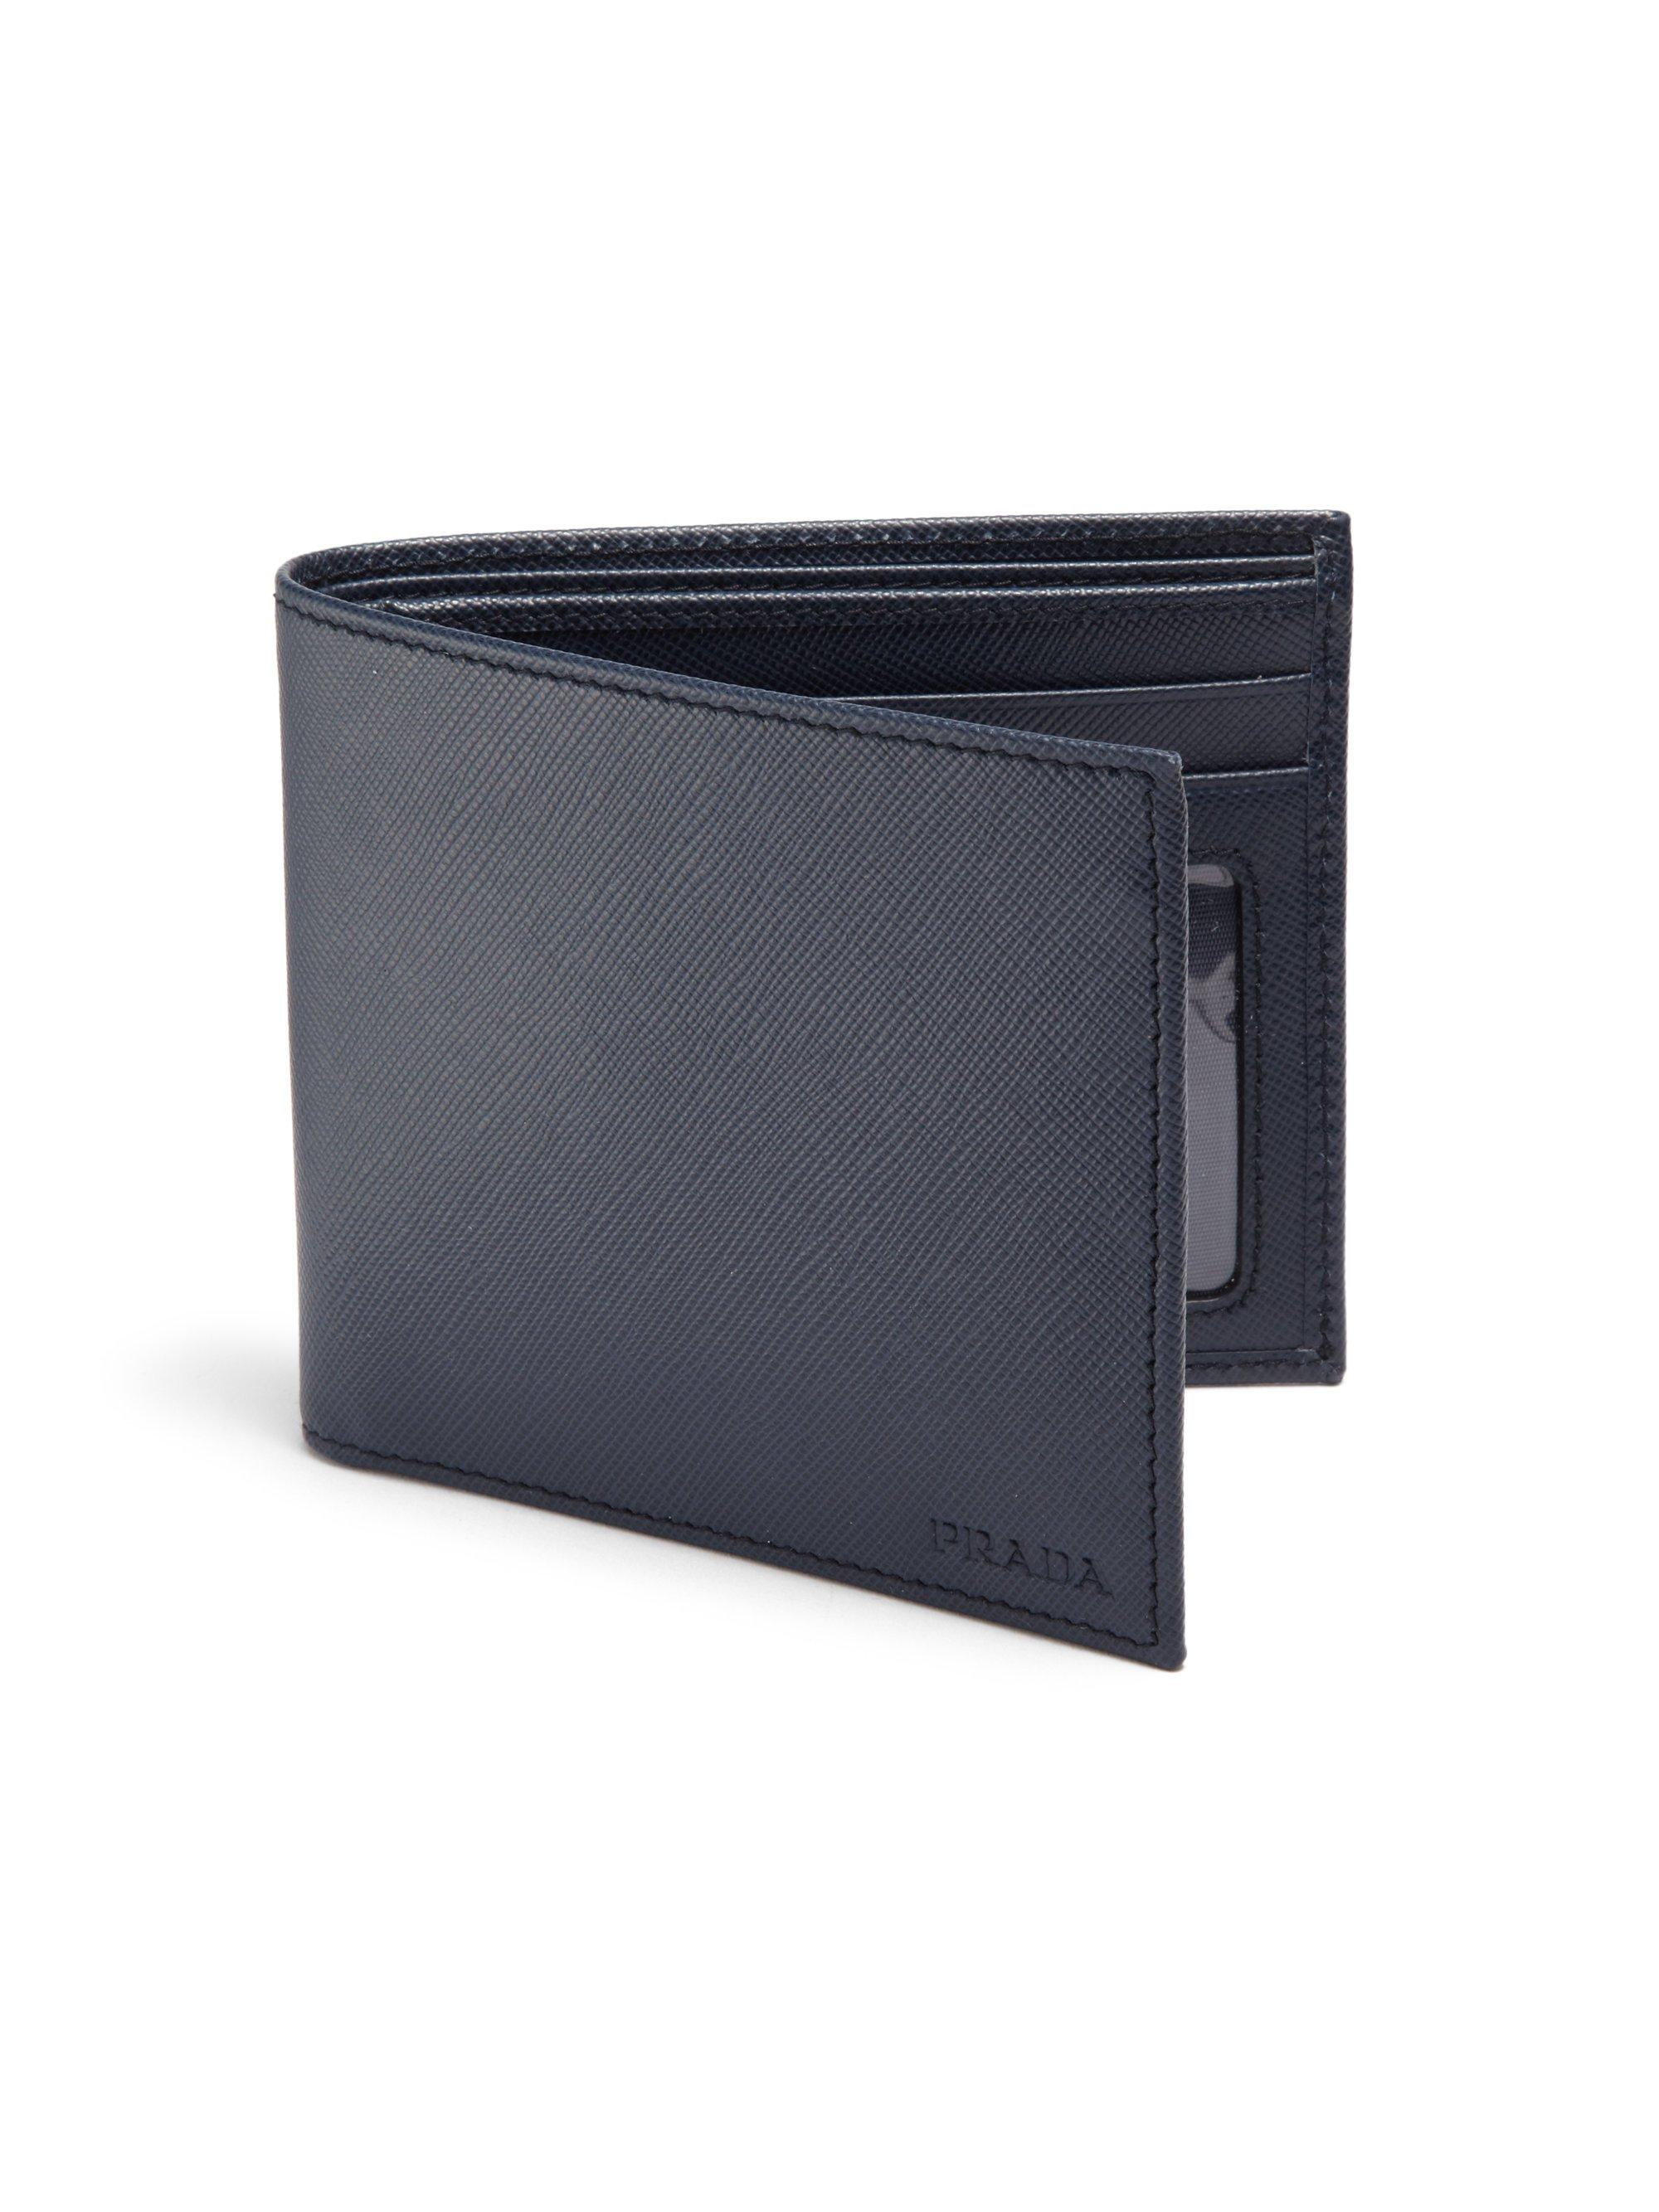 prada men's leather wallet